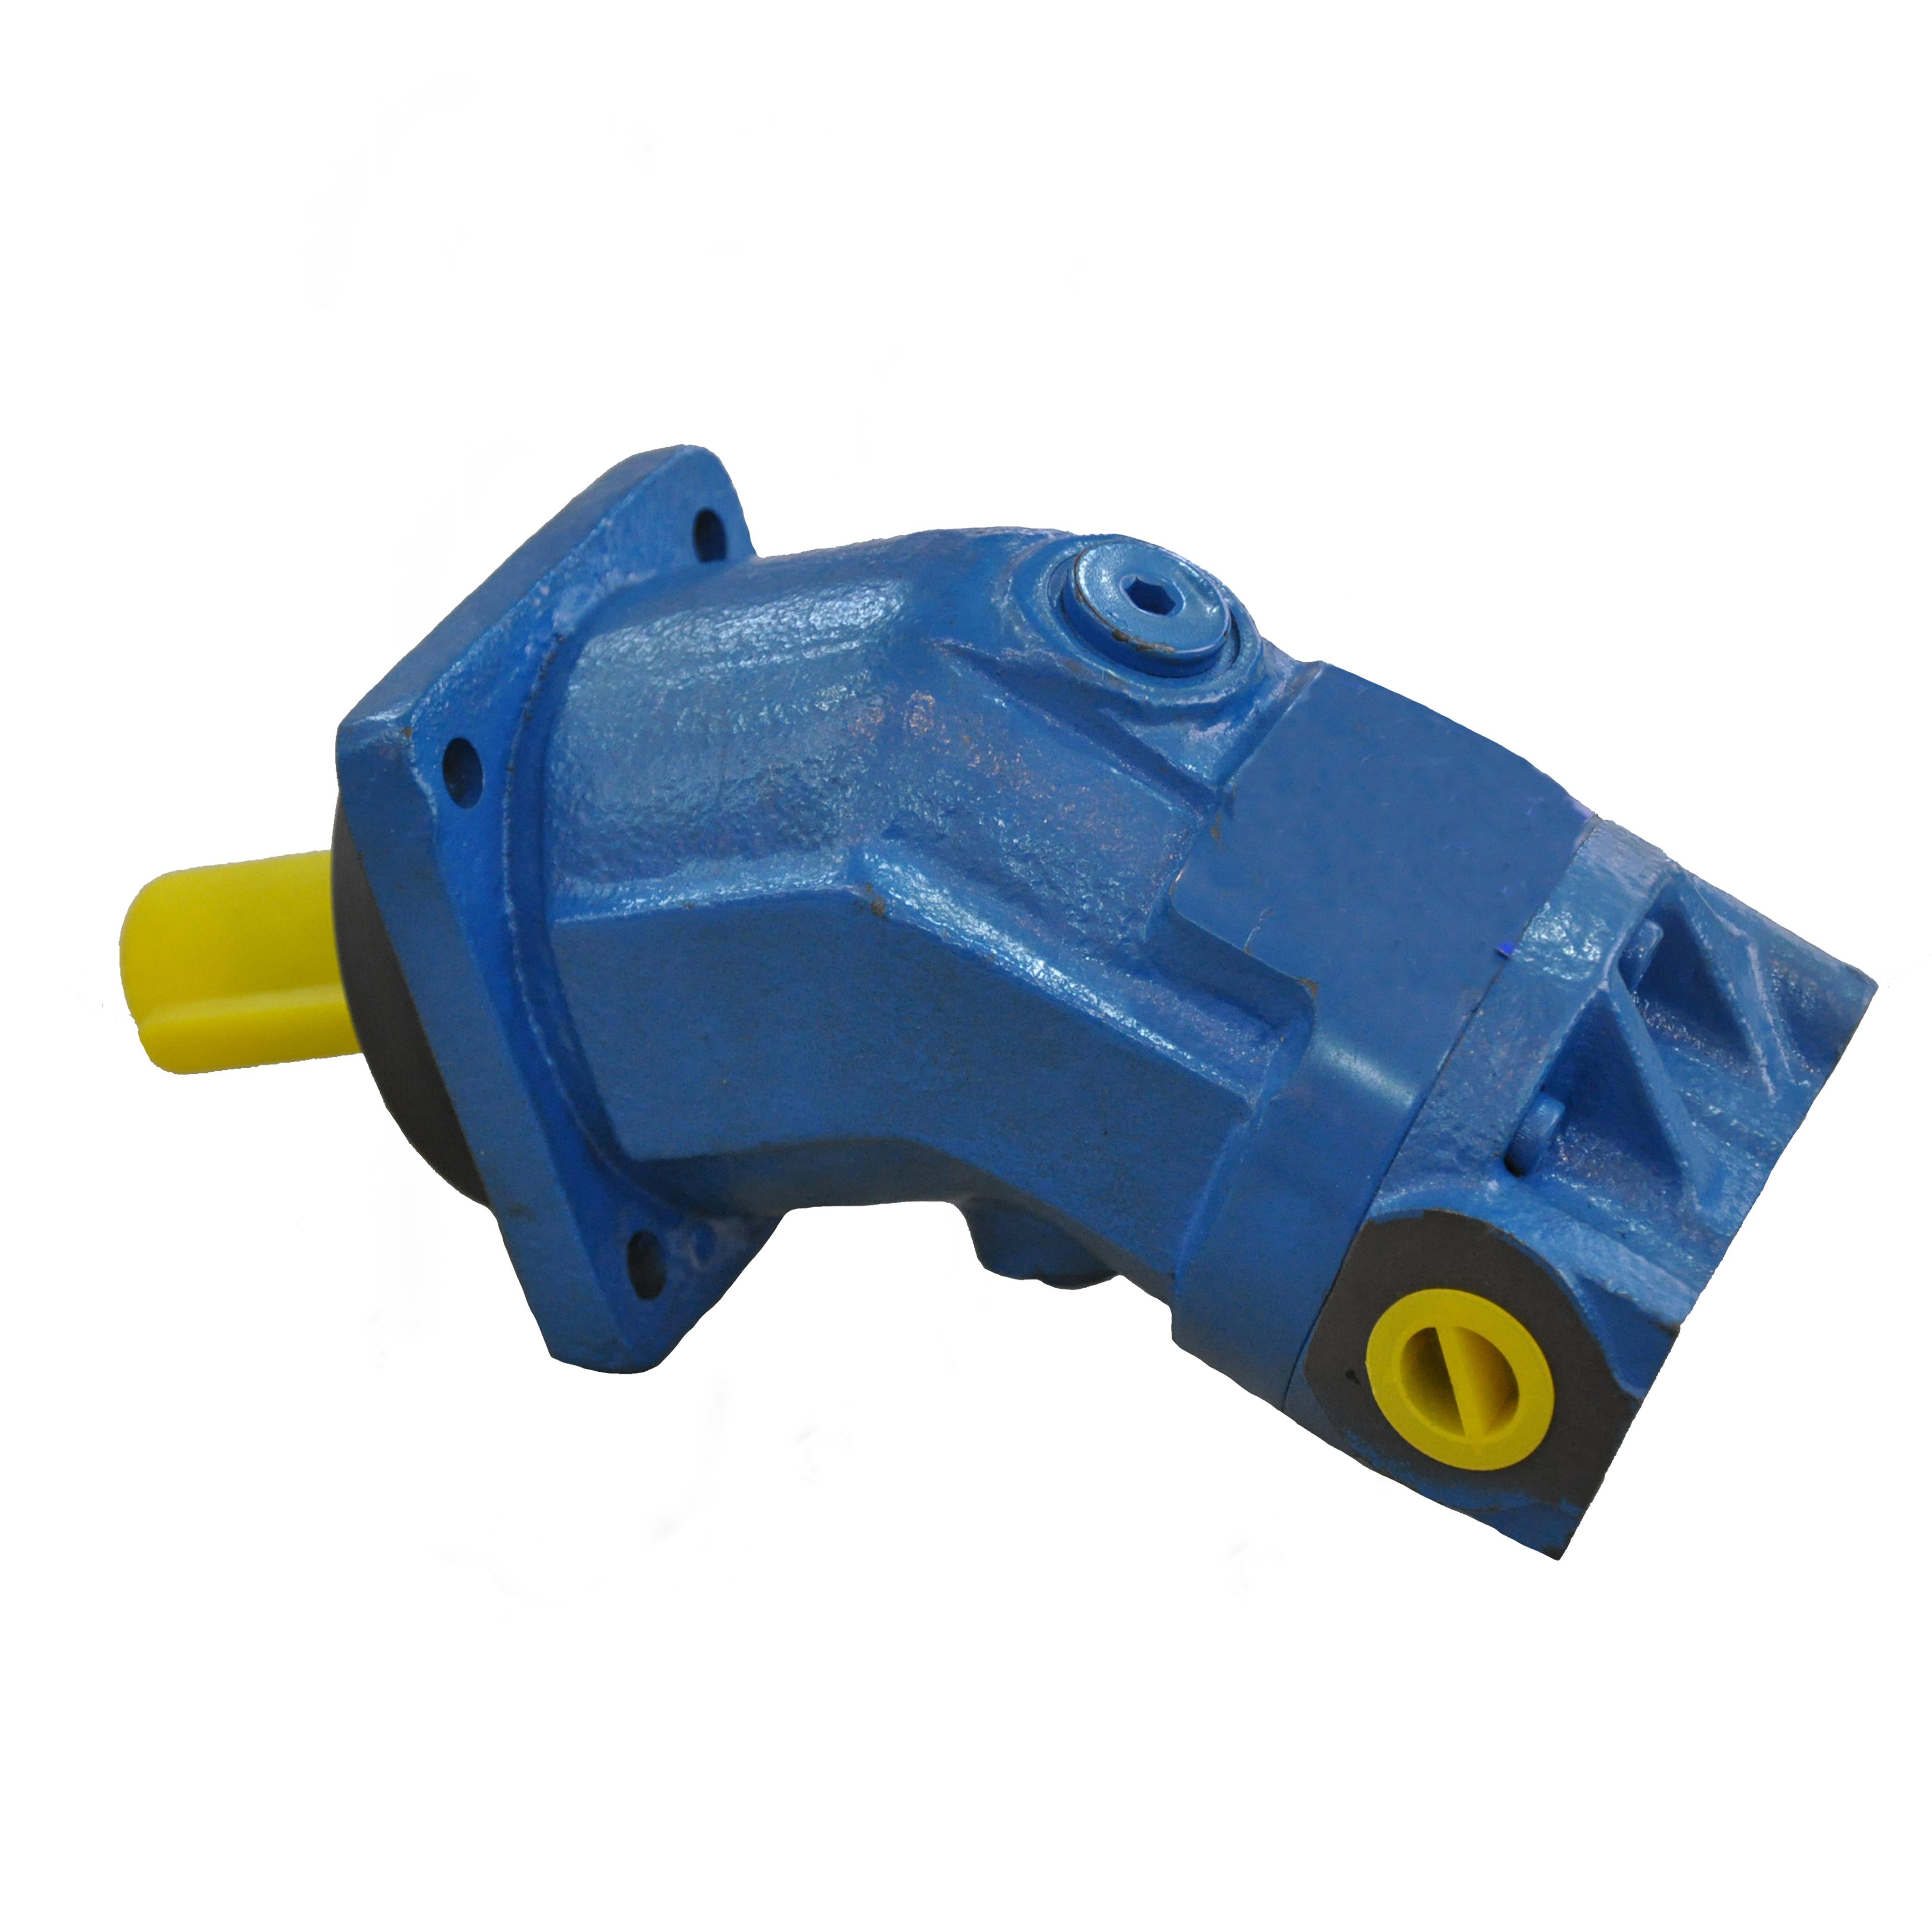 A2F SERIES high pressure piston hydraulic pump